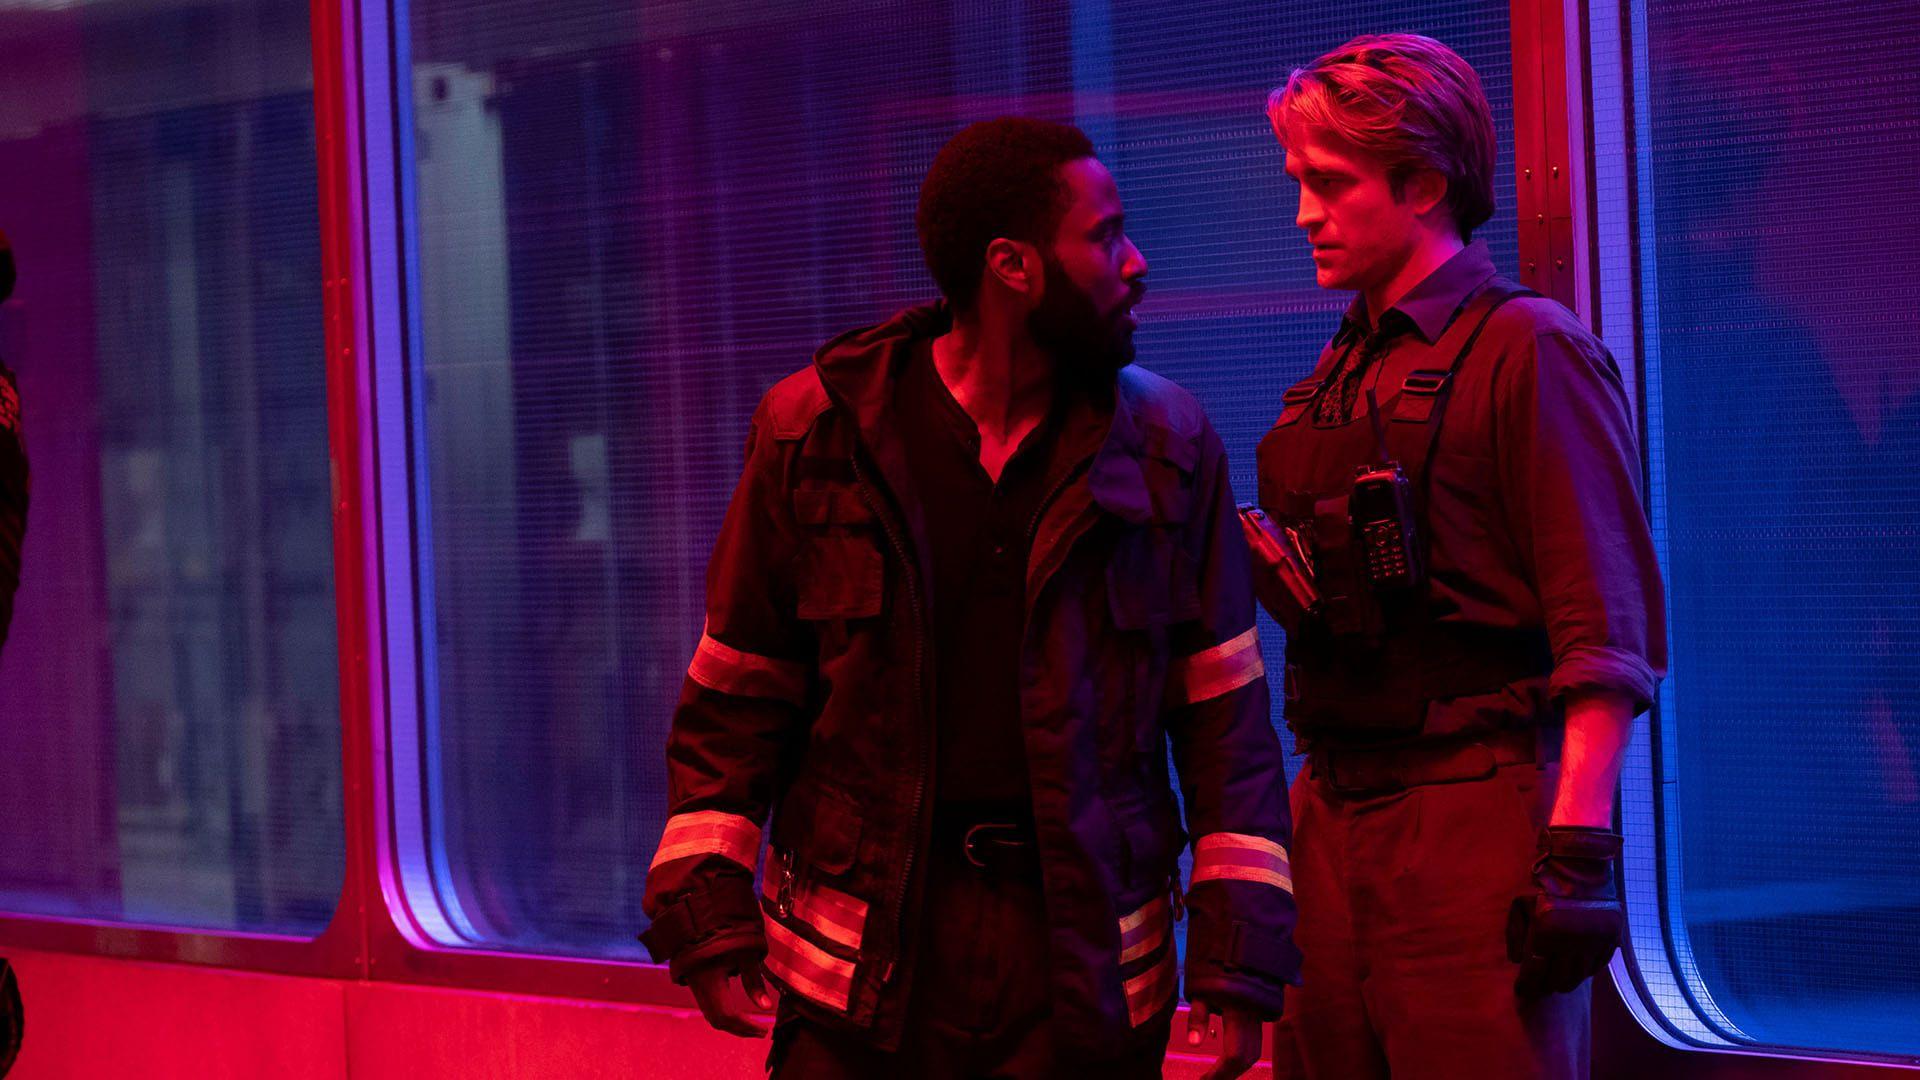 Tenet Online Christopher Nolan Movies Robert Pattinson